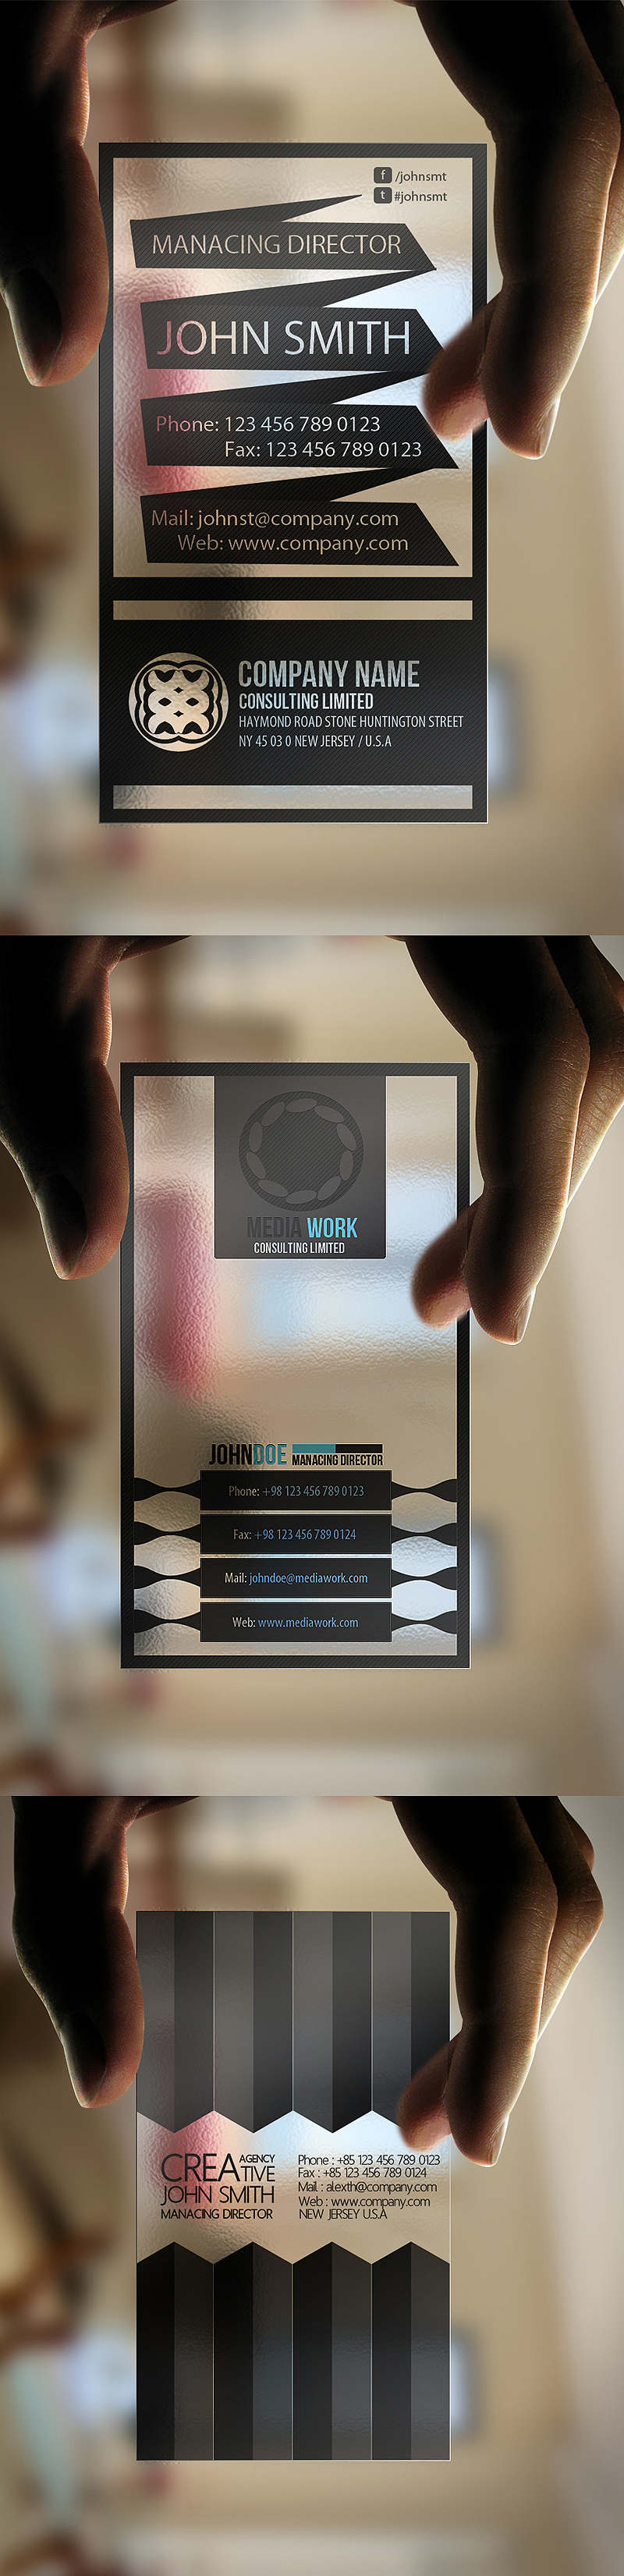 Transparent Bundle 3 in 1 Bundle by calwincalwin